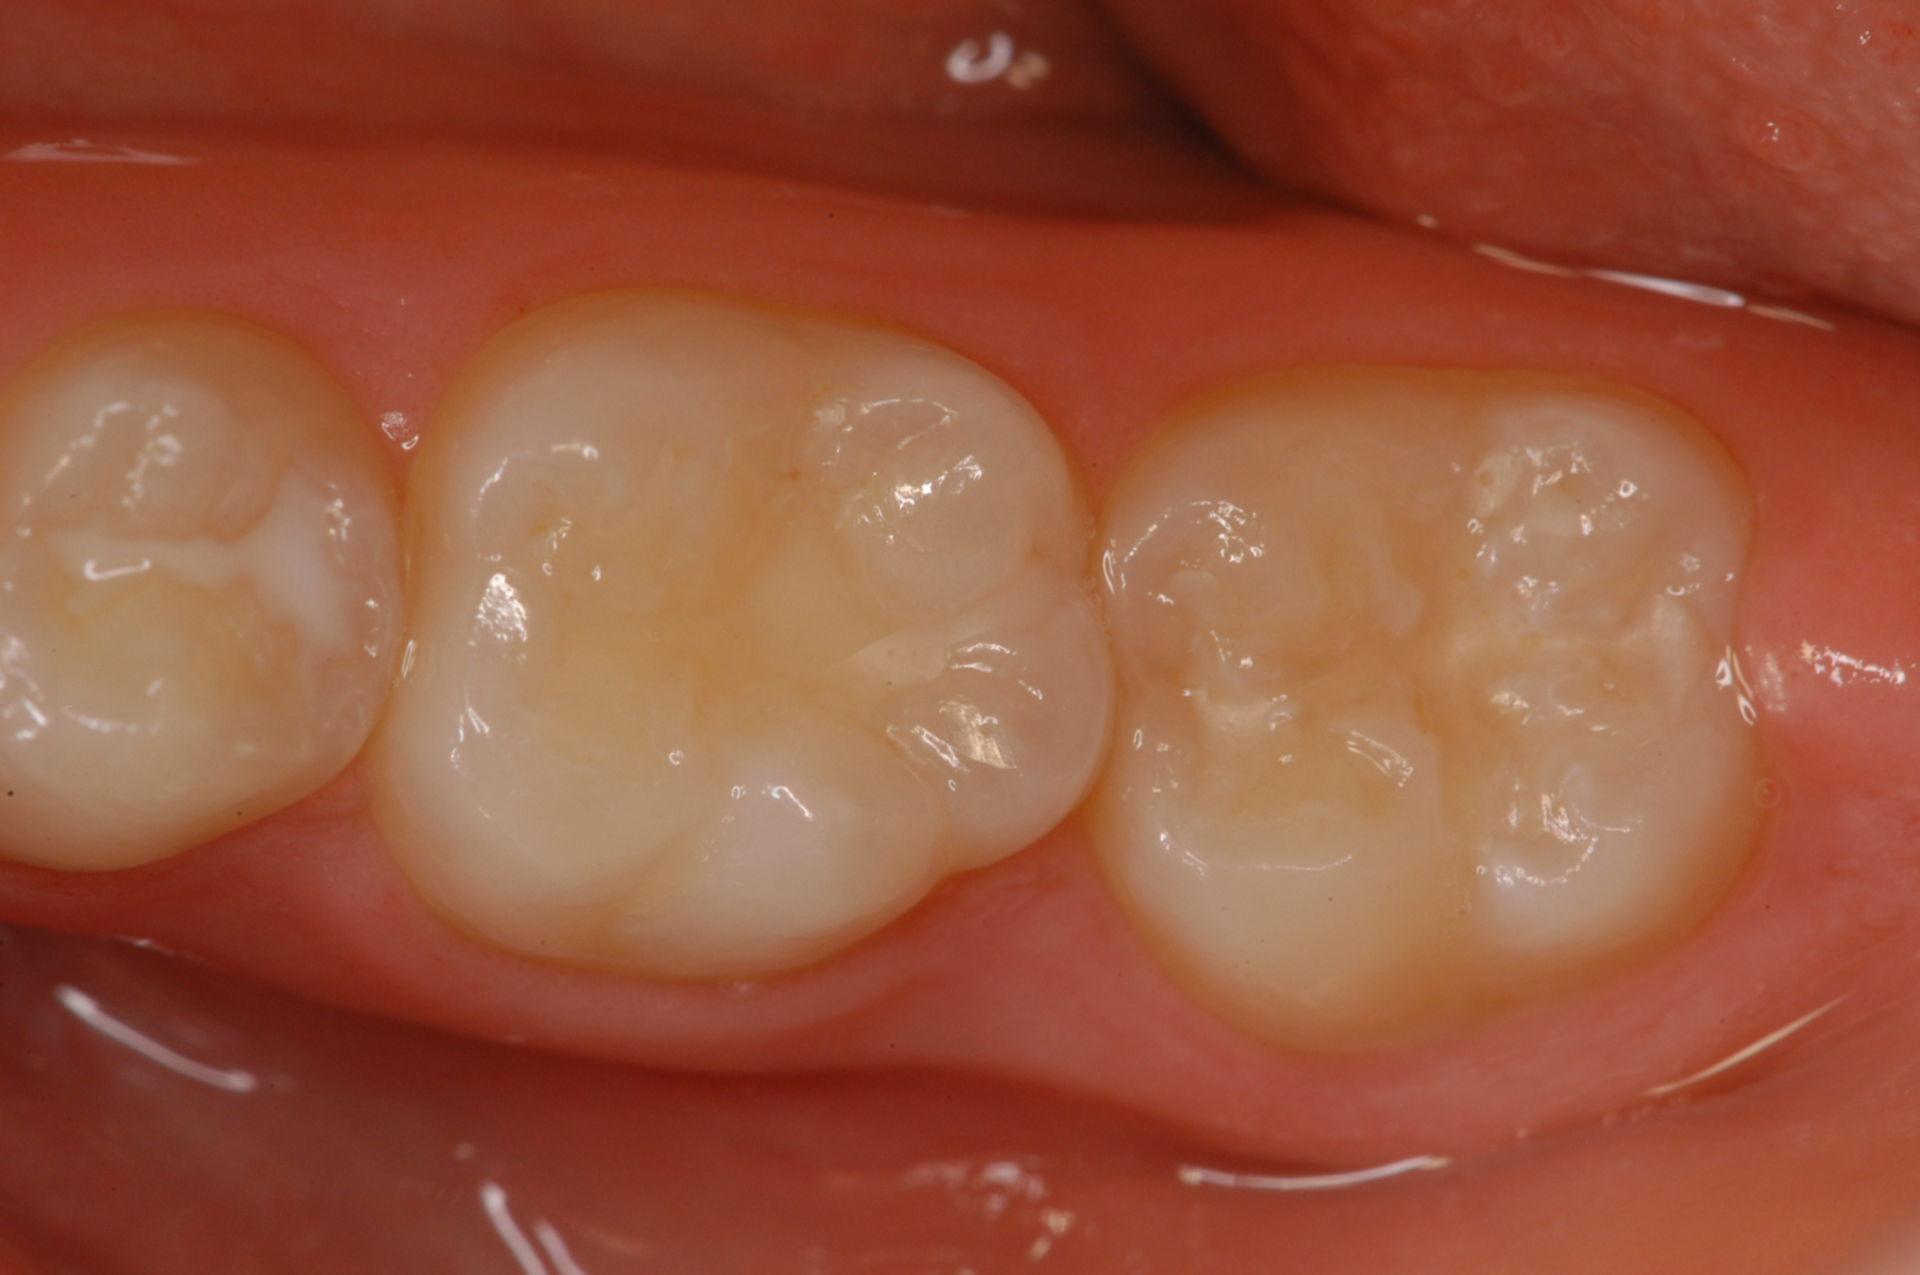 Caries-free mandibular molars left